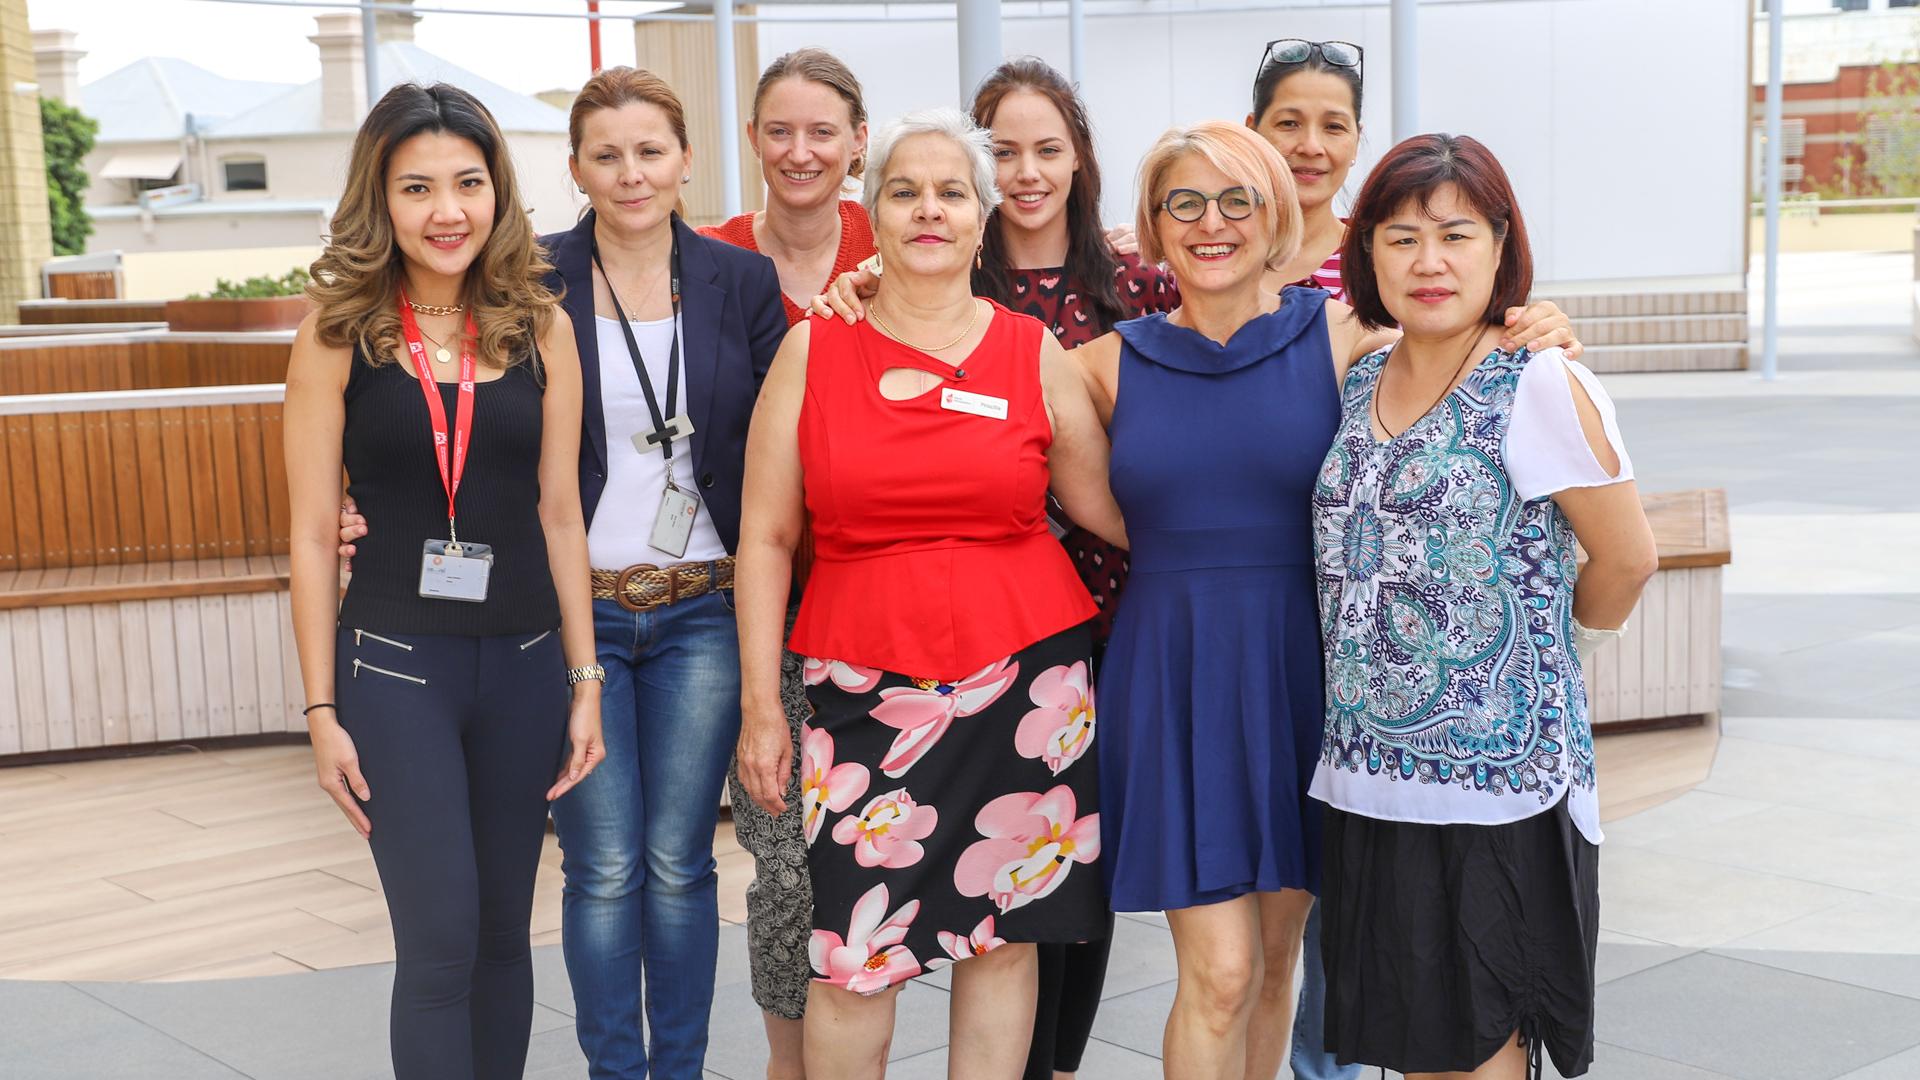 Members of the TAFE Adult Migrant Education Program